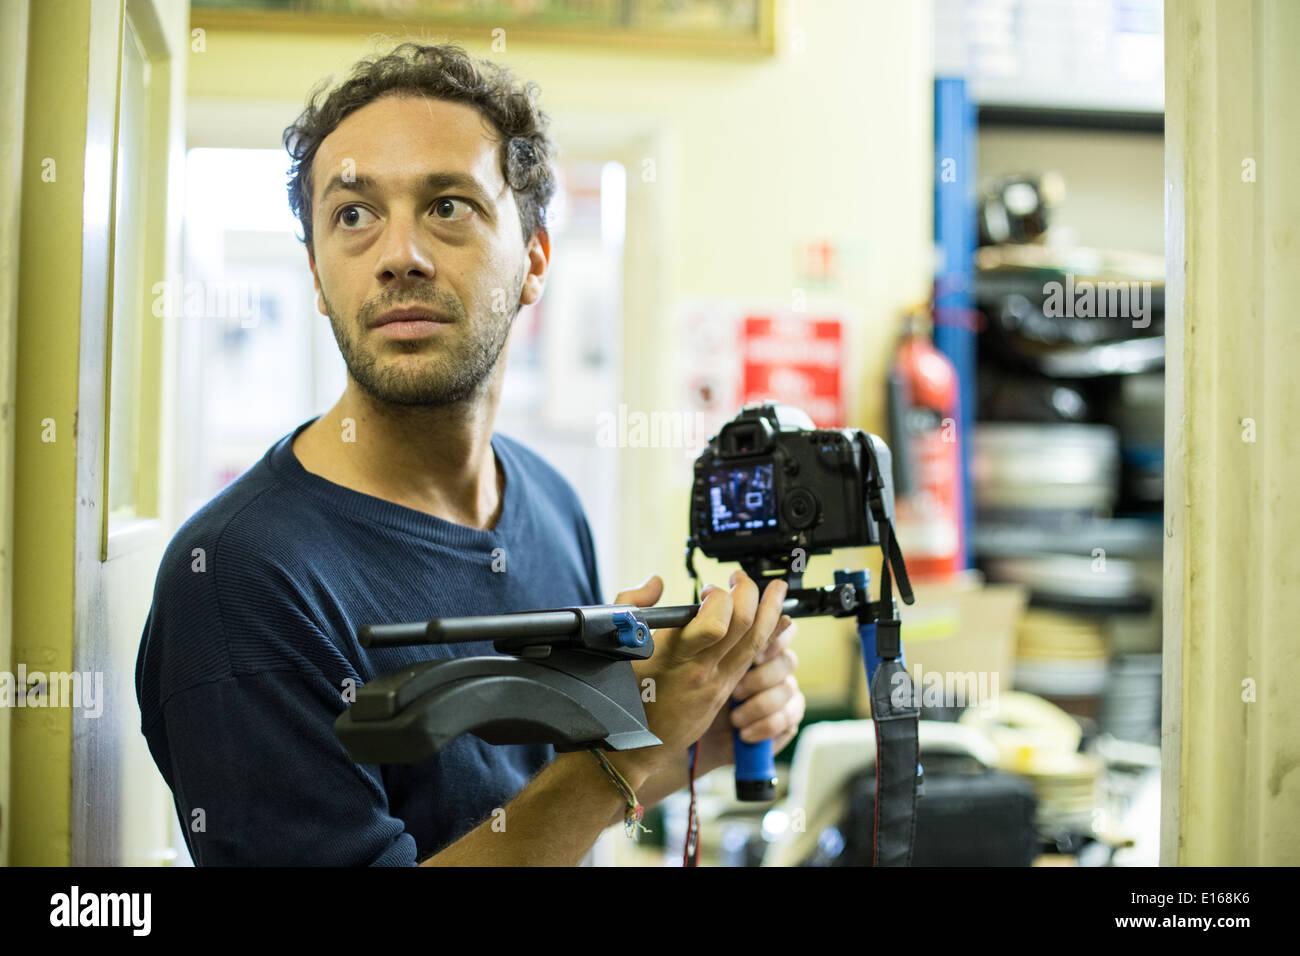 italian film maker filming footage on digital camera at tony scott's film lab in acton london - Stock Image